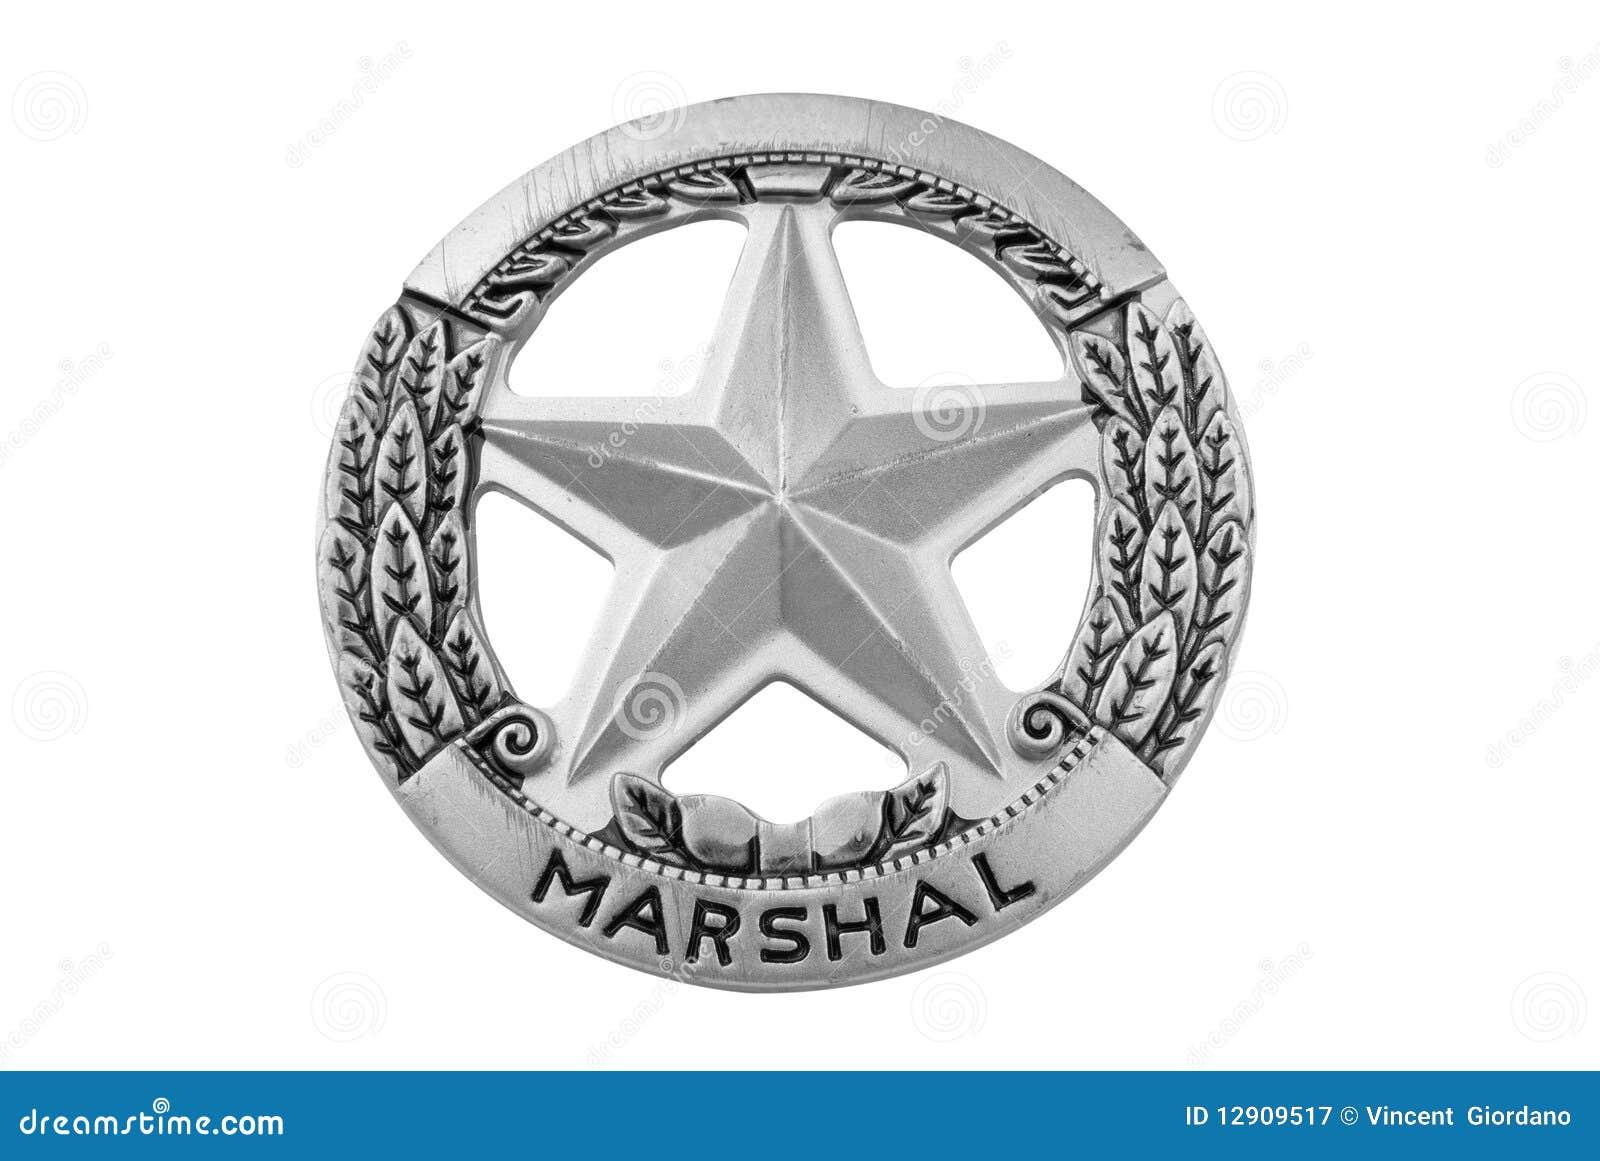 Emblema da estrela do marechal